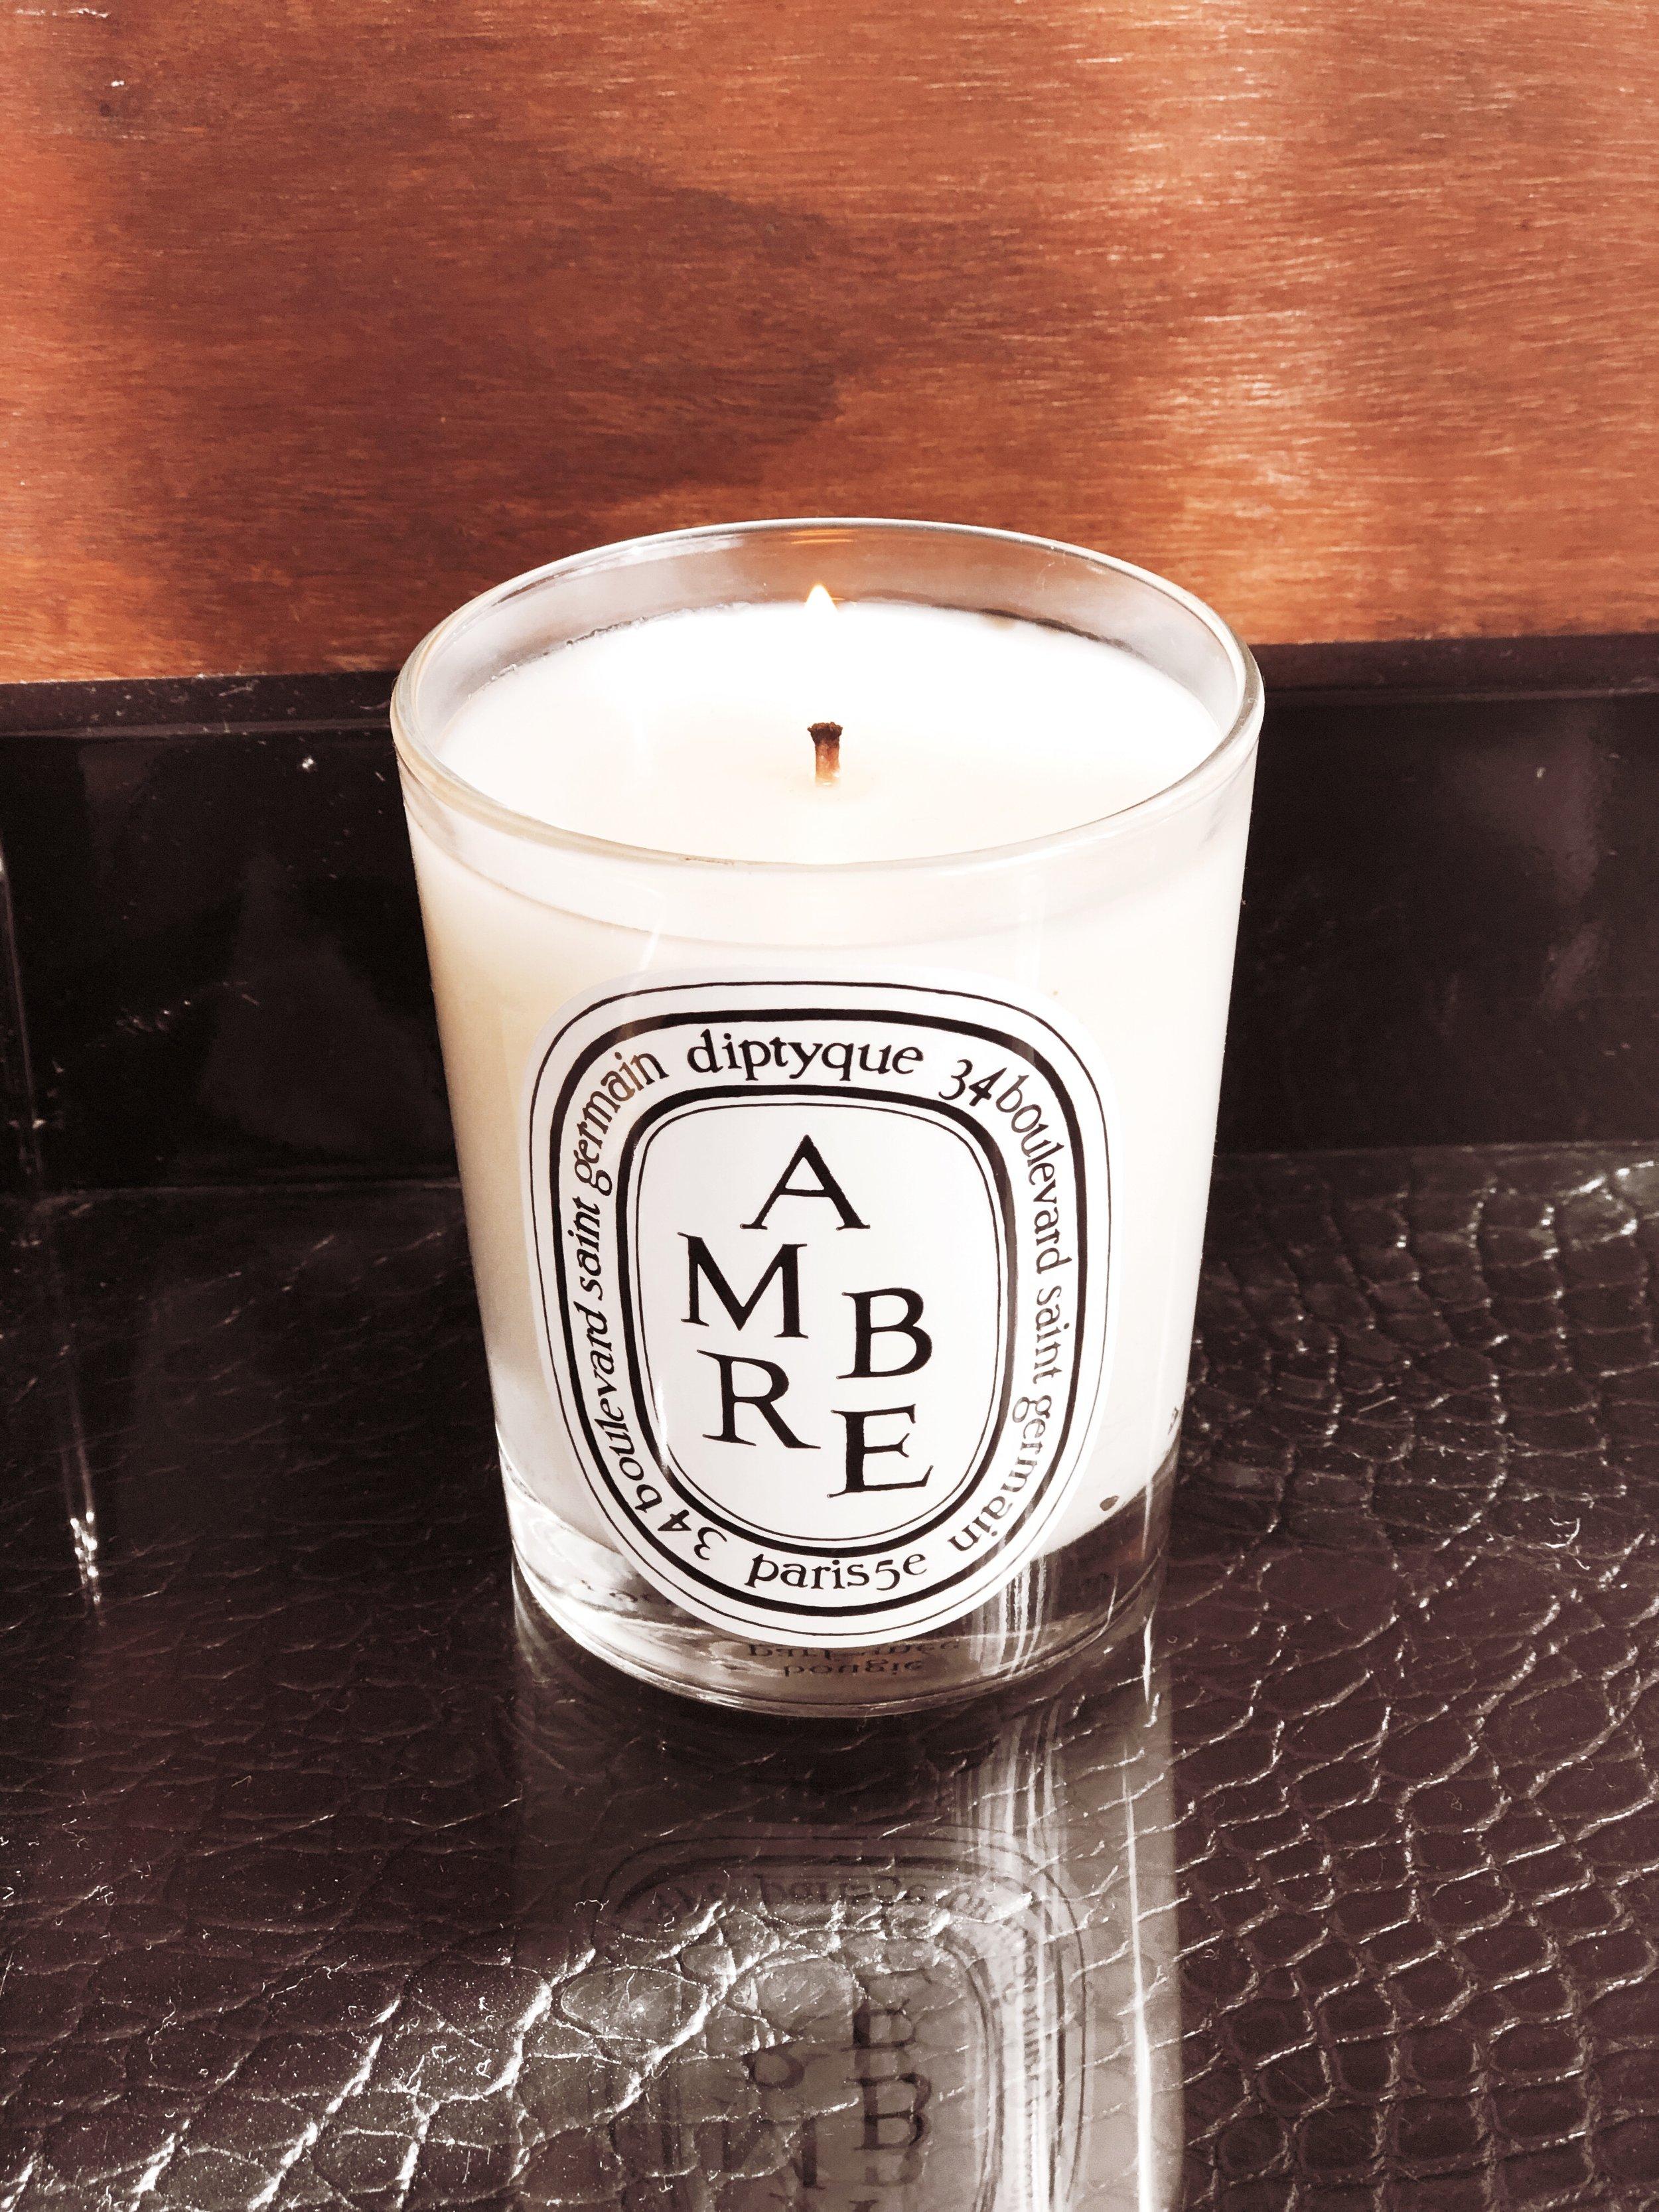 july 2019 lolla winter candles velas favoritas inverno ambre diptyque lolla - Winter Candles: Minhas velas favoritas para o inverno